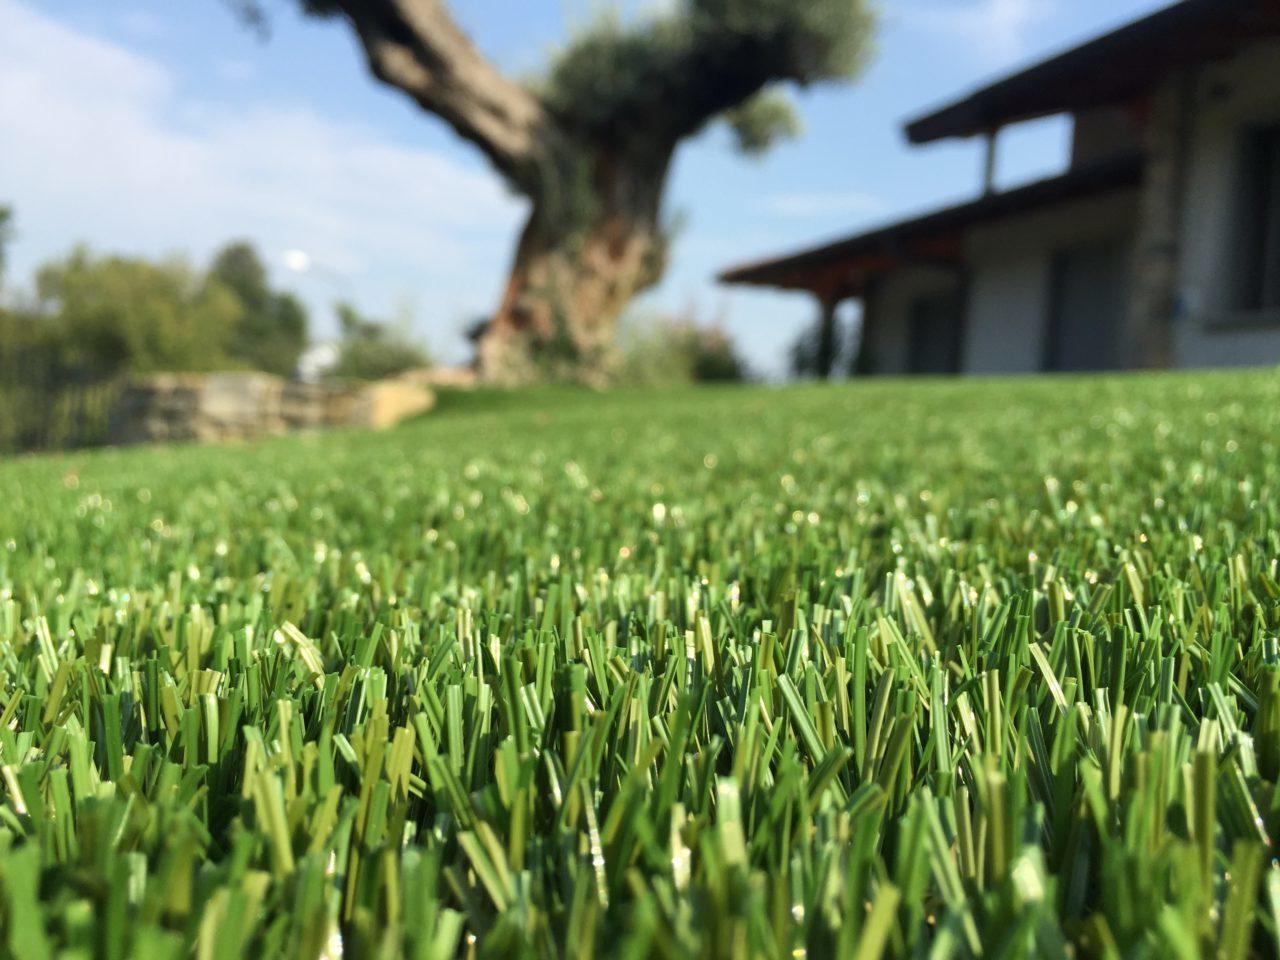 Erba sintetica d 39 arredo ultrareale - Erba sintetica da giardino ...